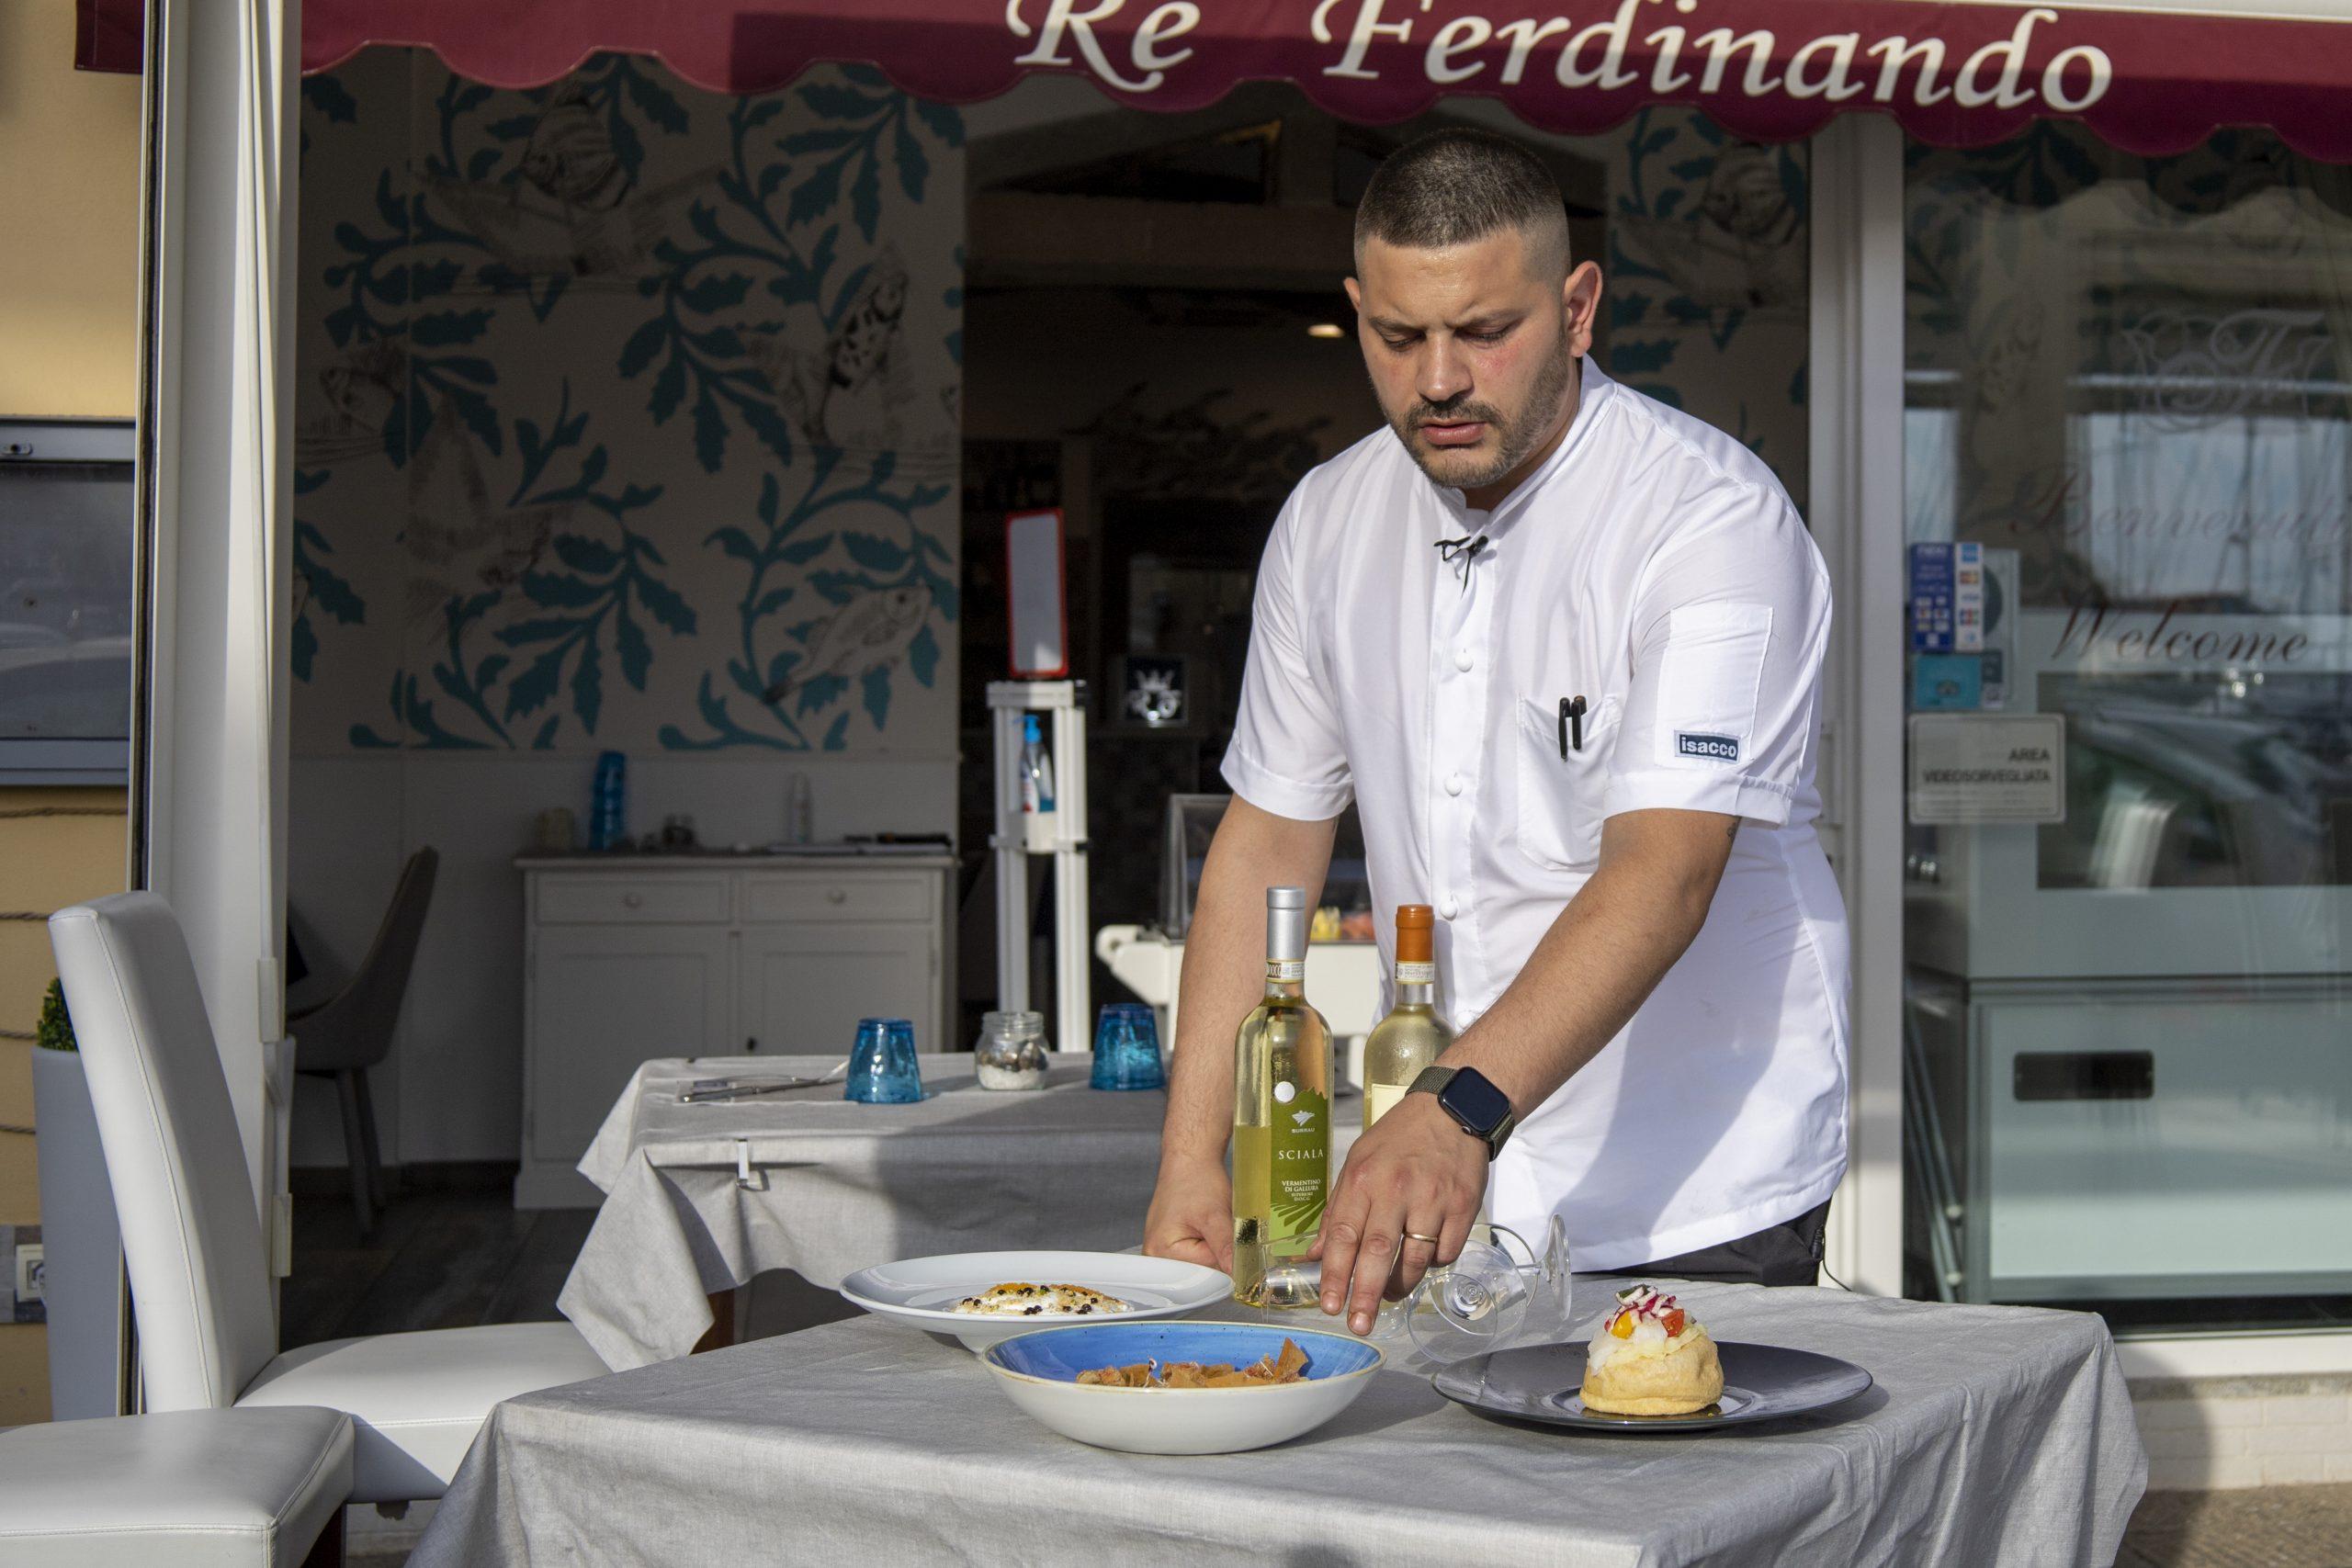 Ristorante Re Ferdinando